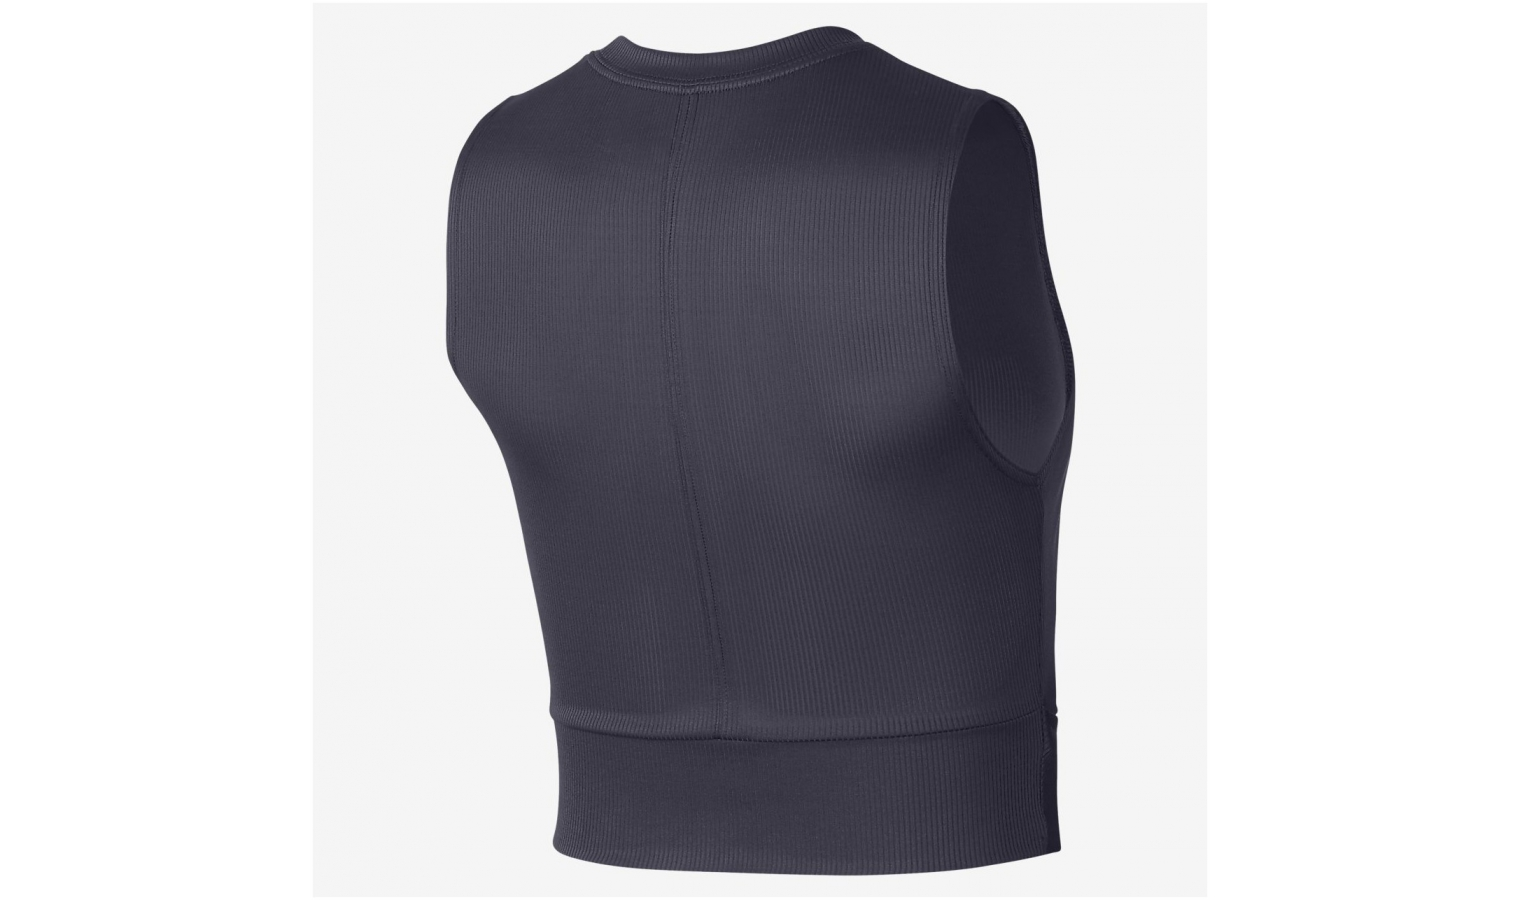 419f6ac2a638 Dámske funkčné tričko Nike NK DRY TANK CROP TWIST HO W modré